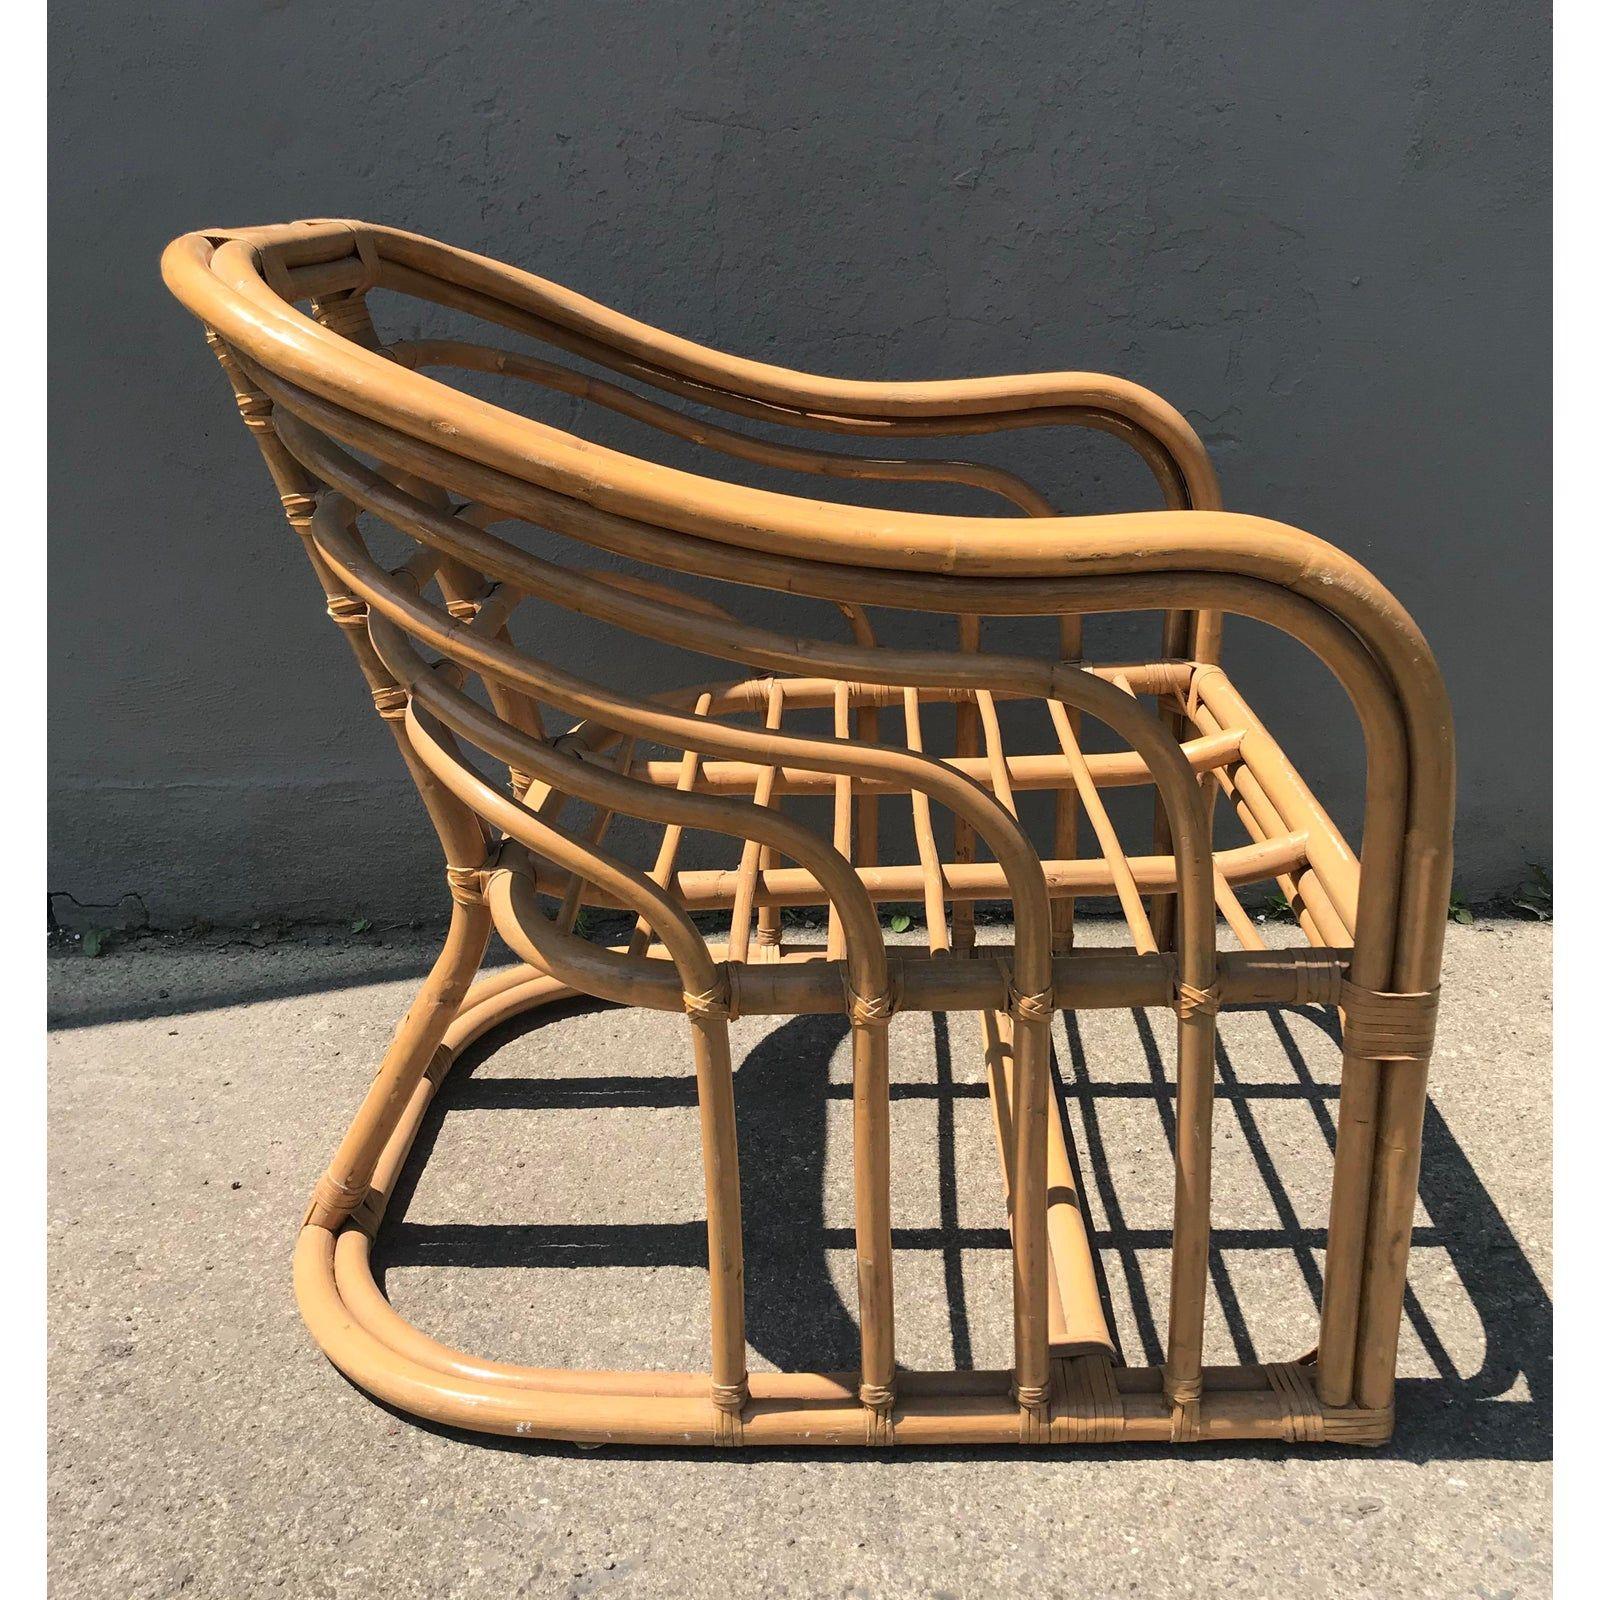 1970s vintage rattan lounge chair chairish lounge